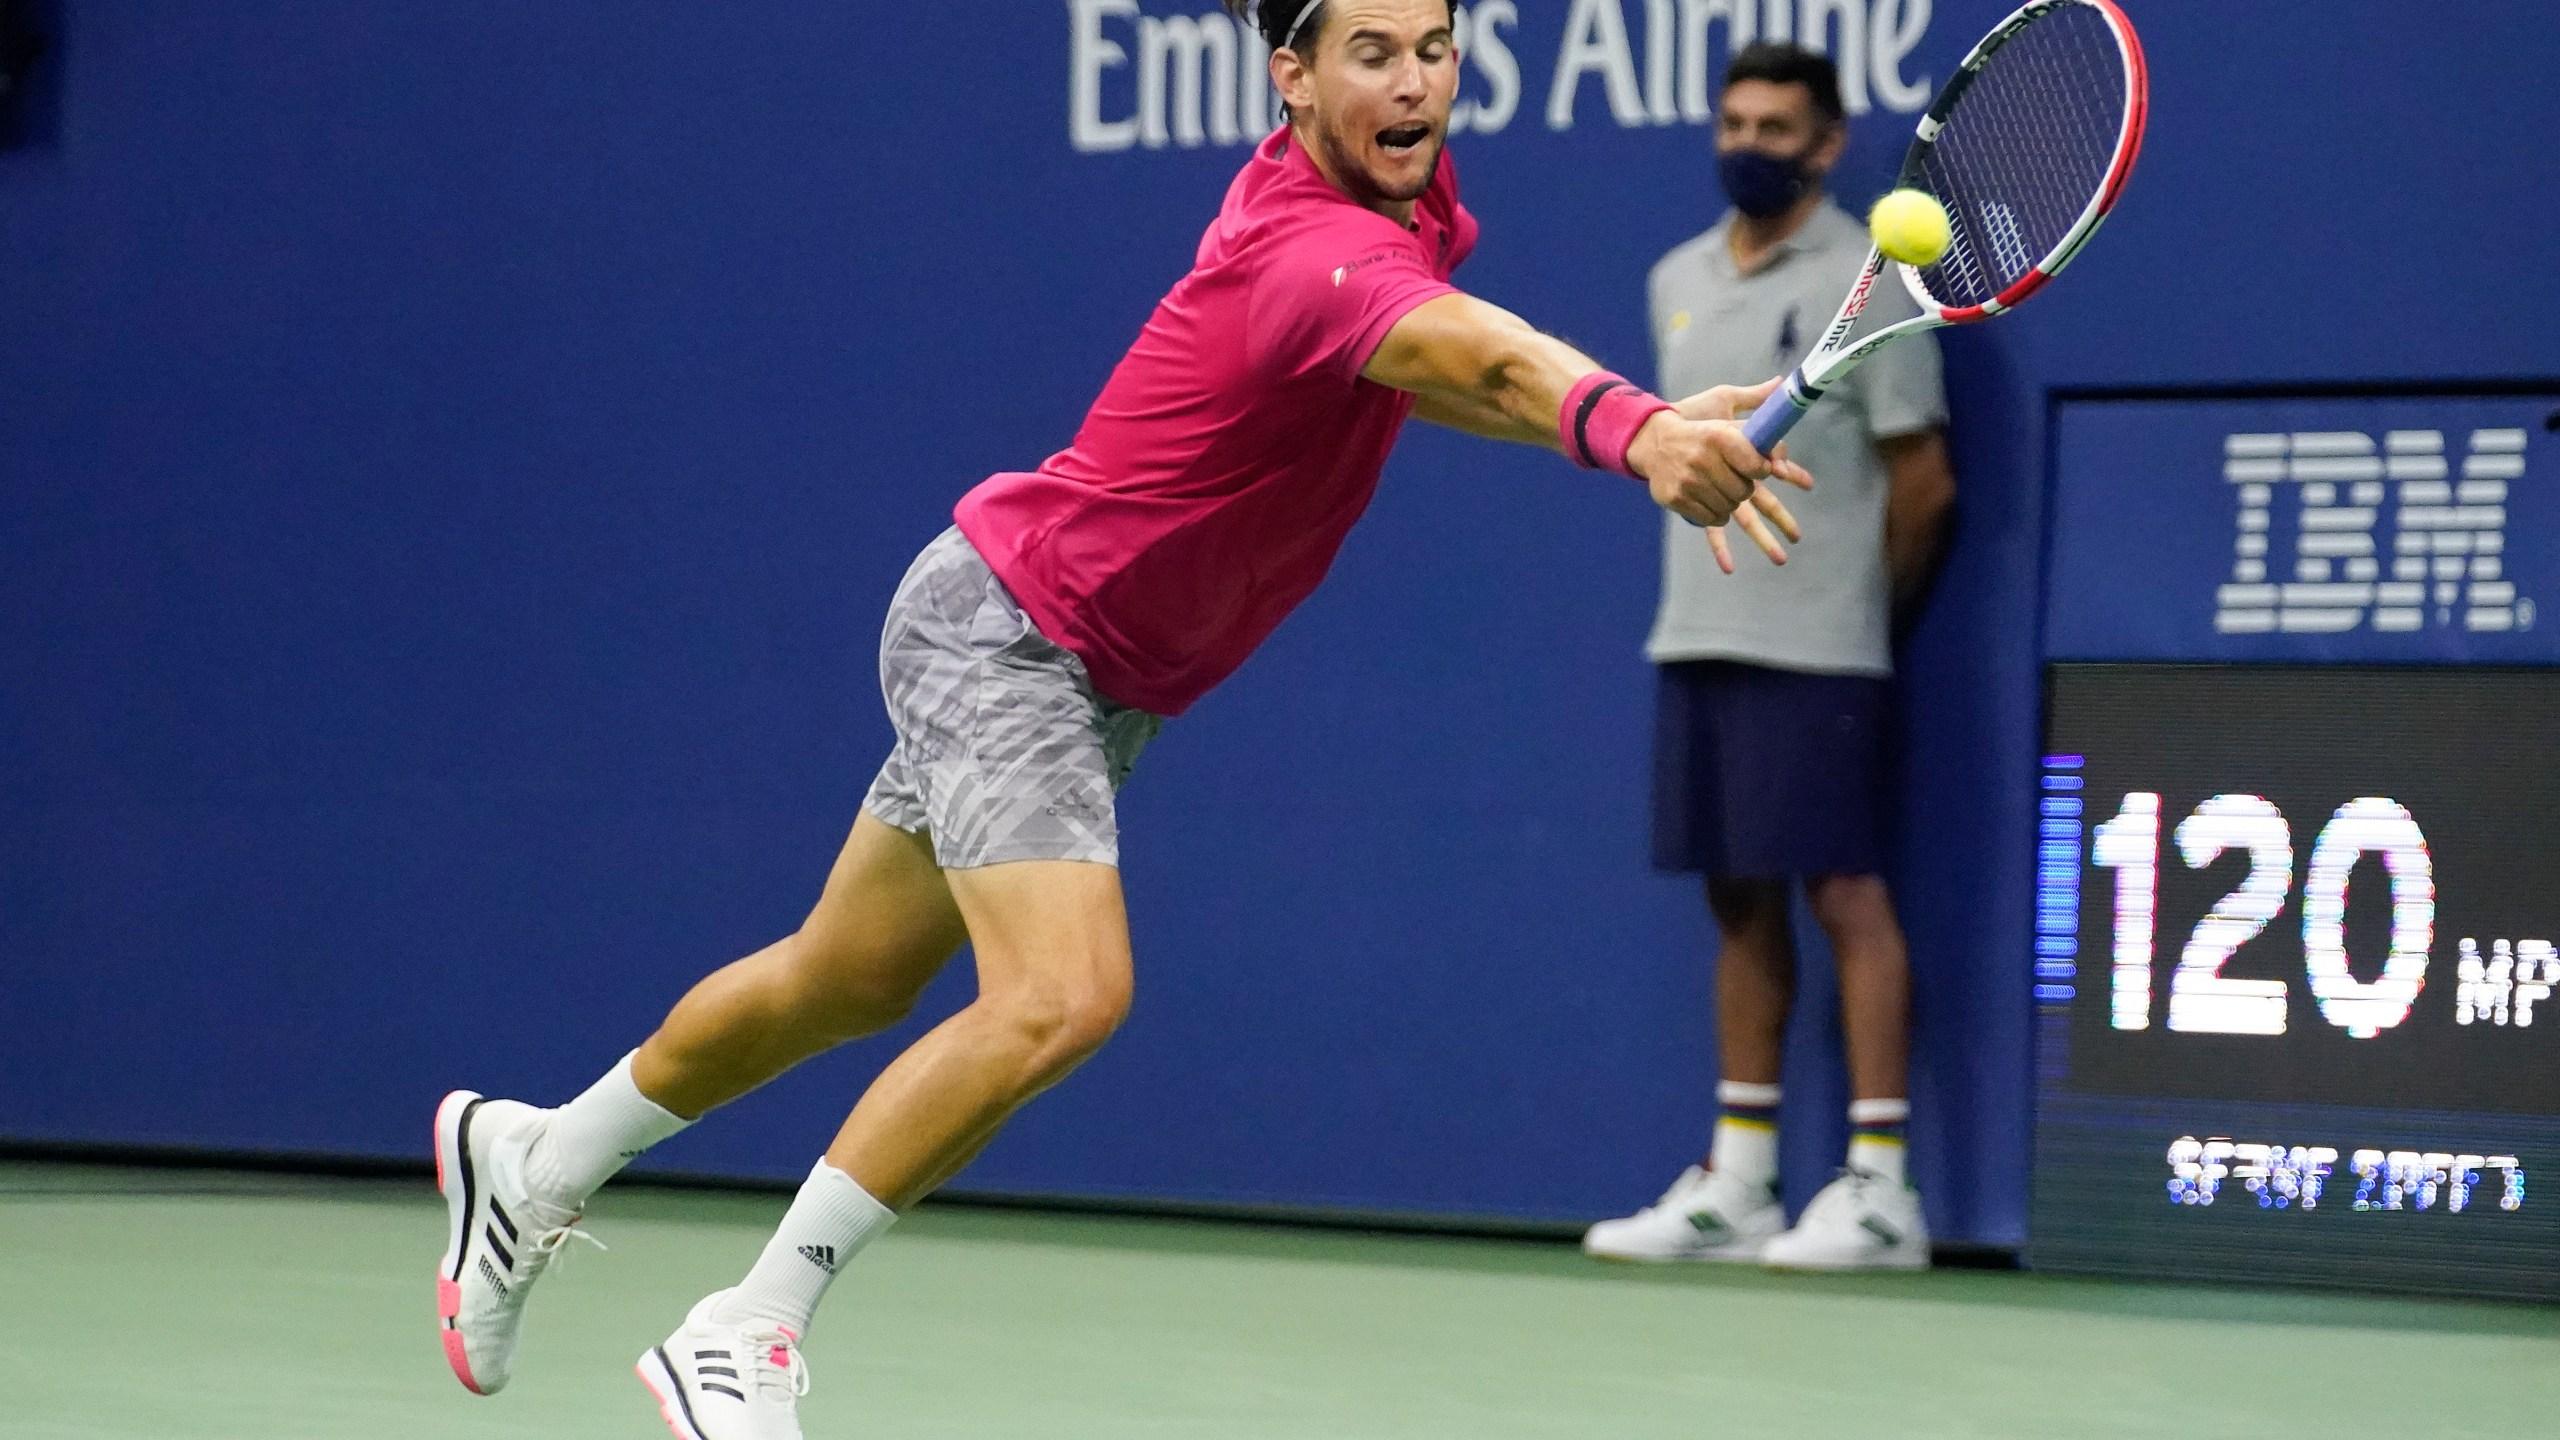 Tennis tiebreaker fifth set investment burgess rawson investment portfolio auction time